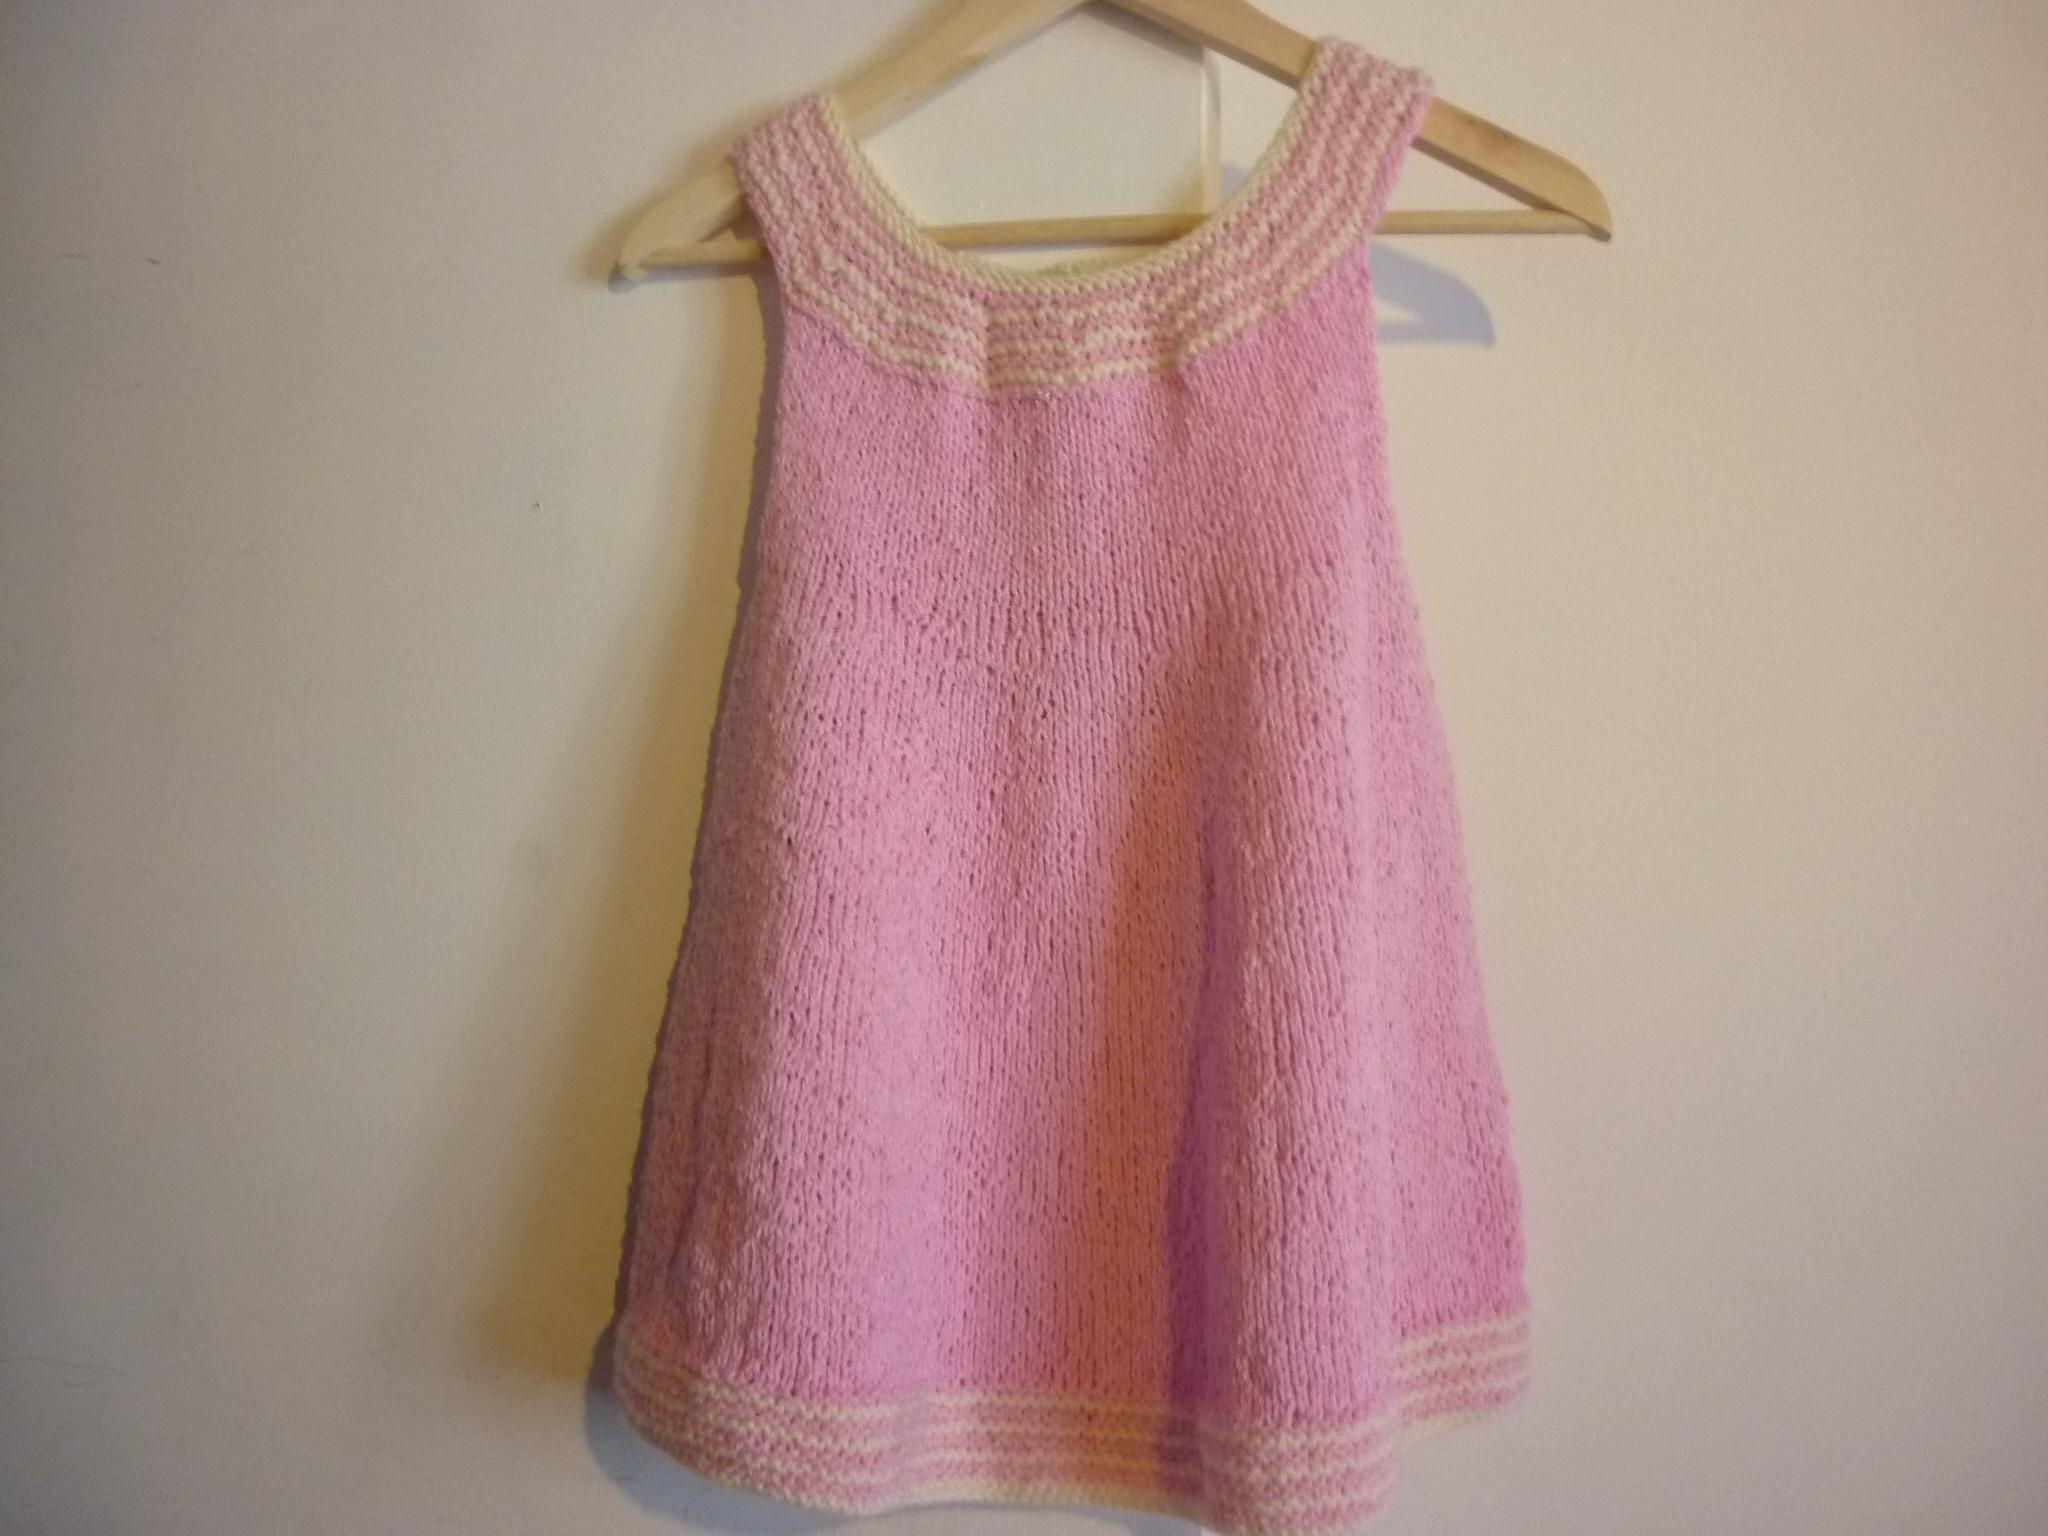 62851175ae7 modèle robe tricot pour fille